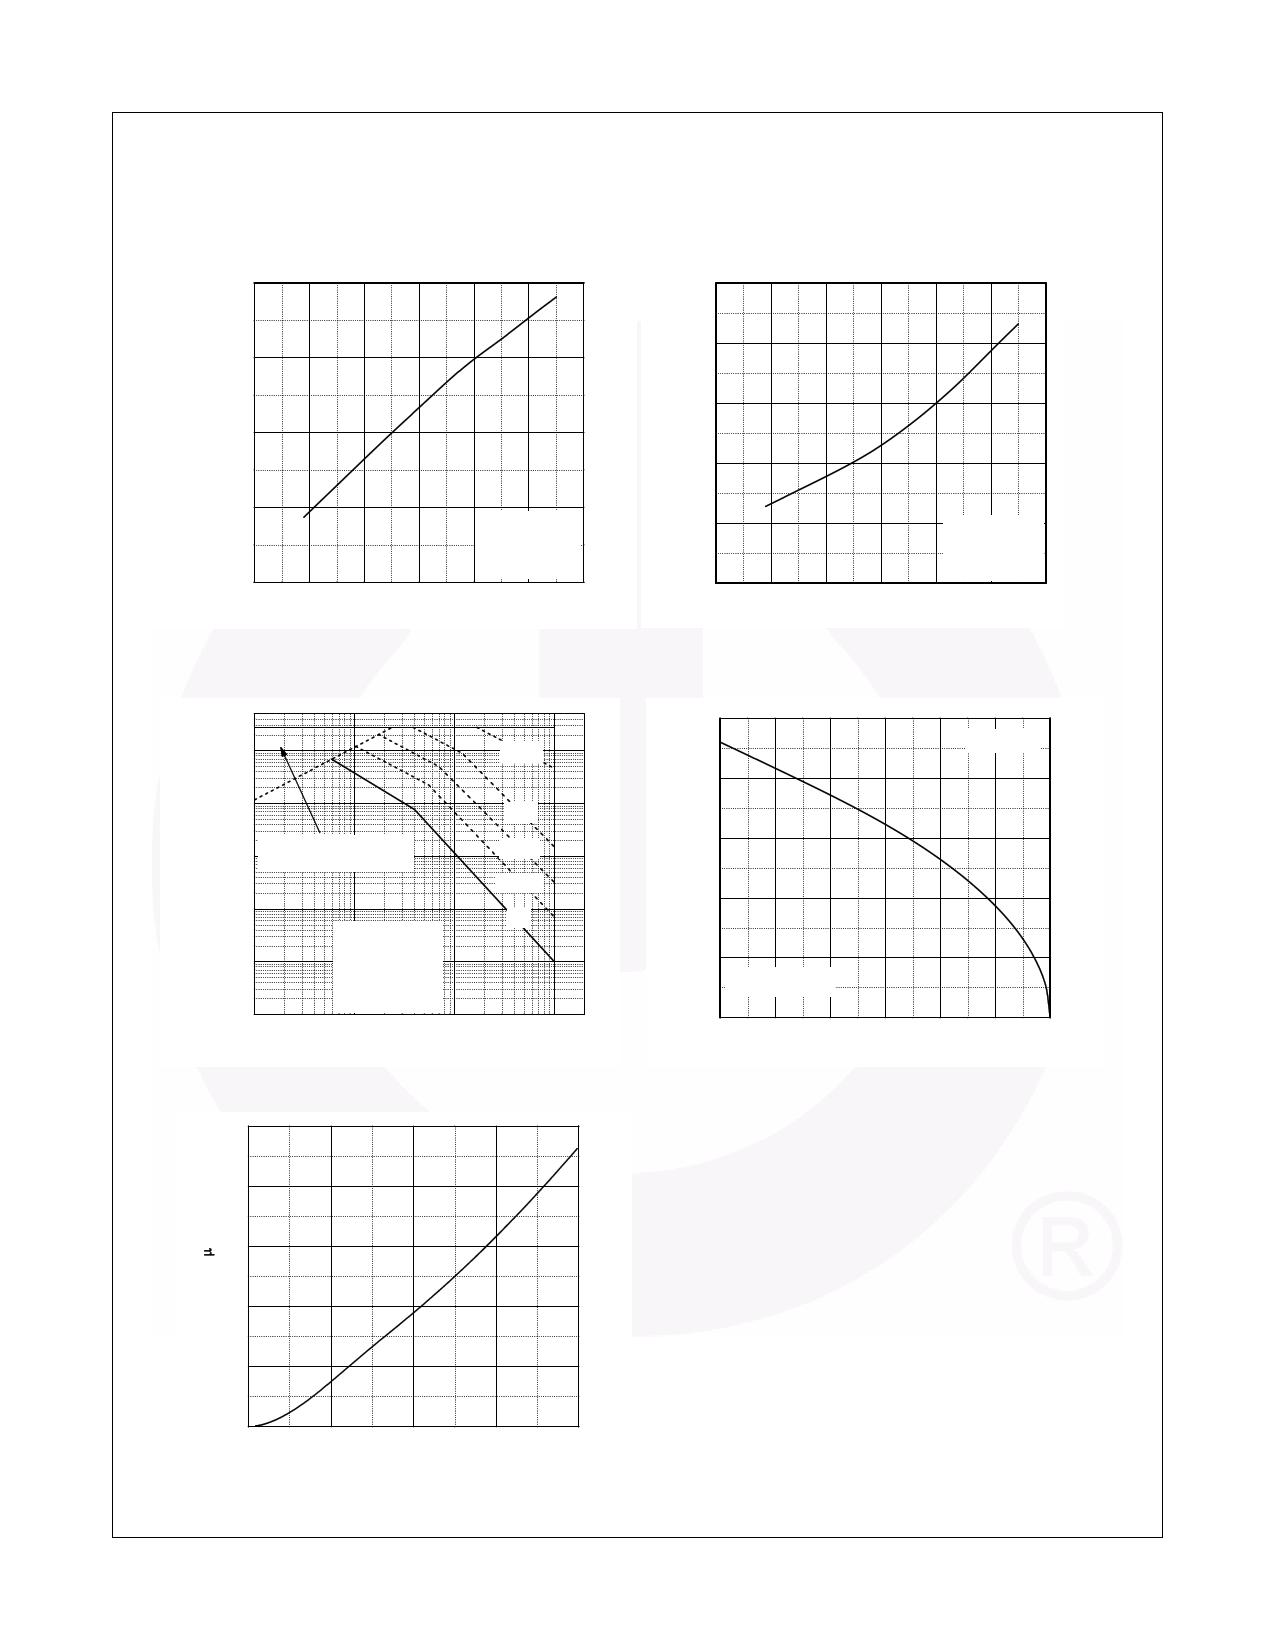 FDPF045N10A pdf, 반도체, 판매, 대치품